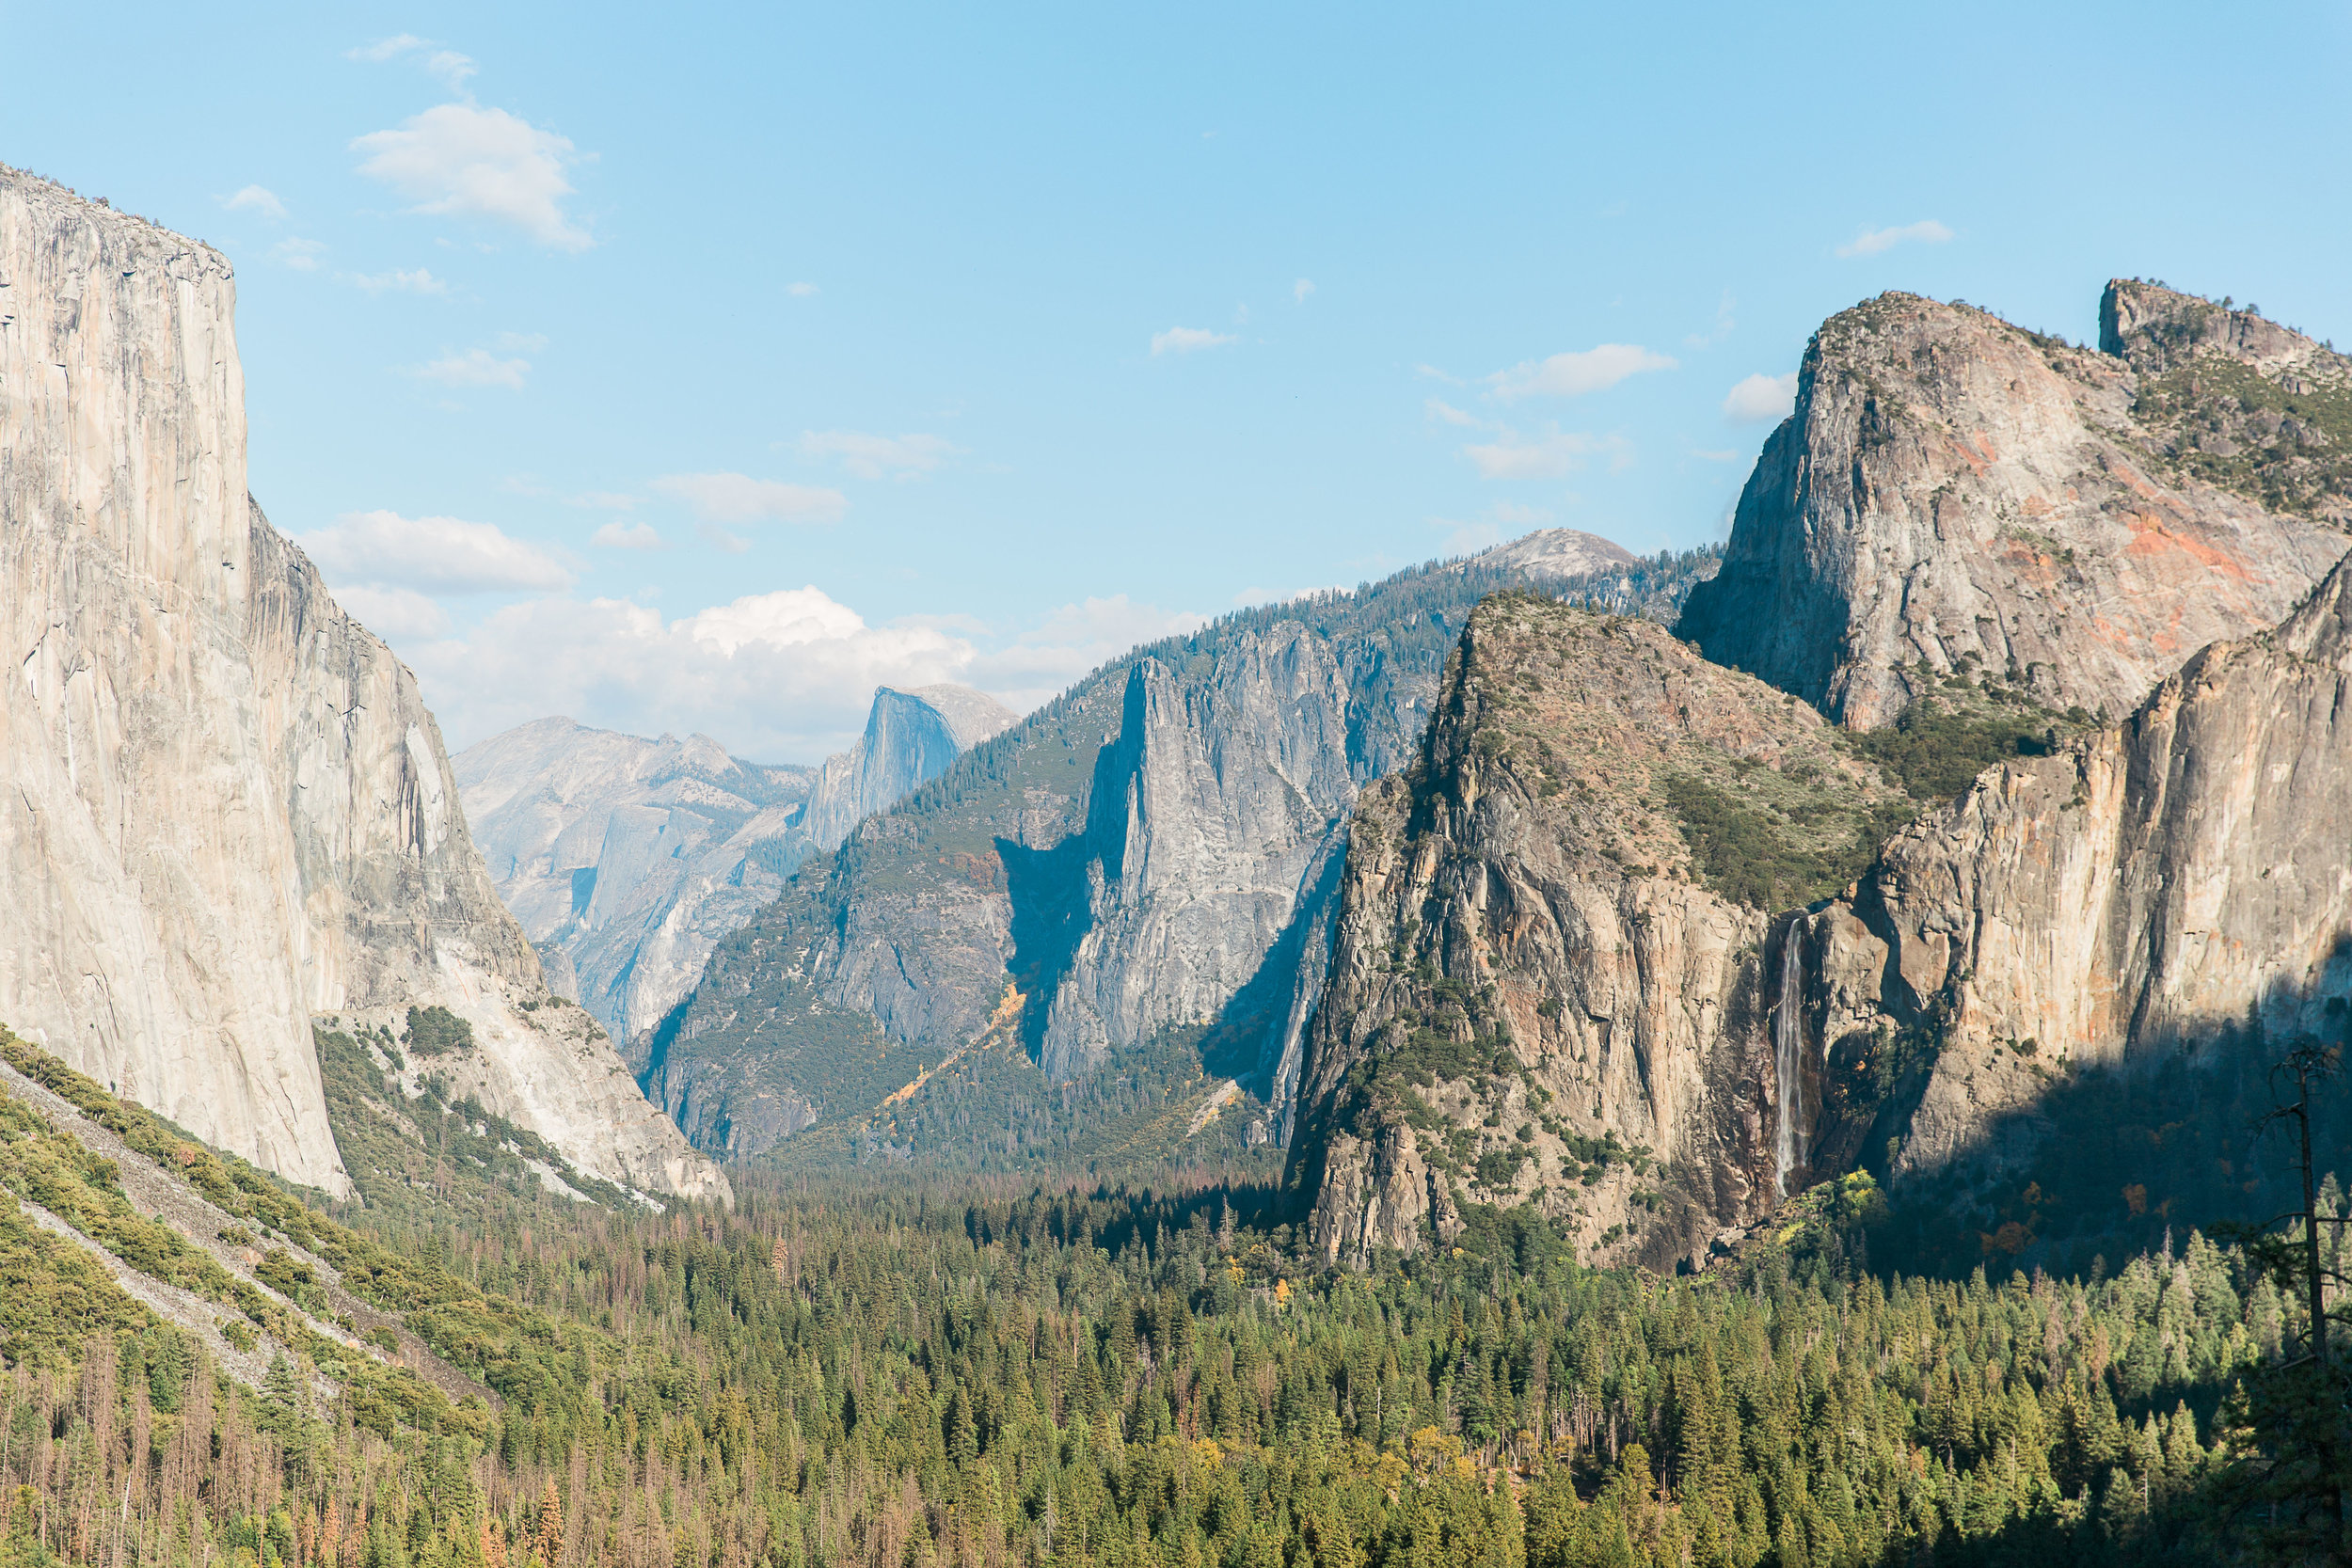 Yosemite-Photos-JBJ-Pictures (1).jpg